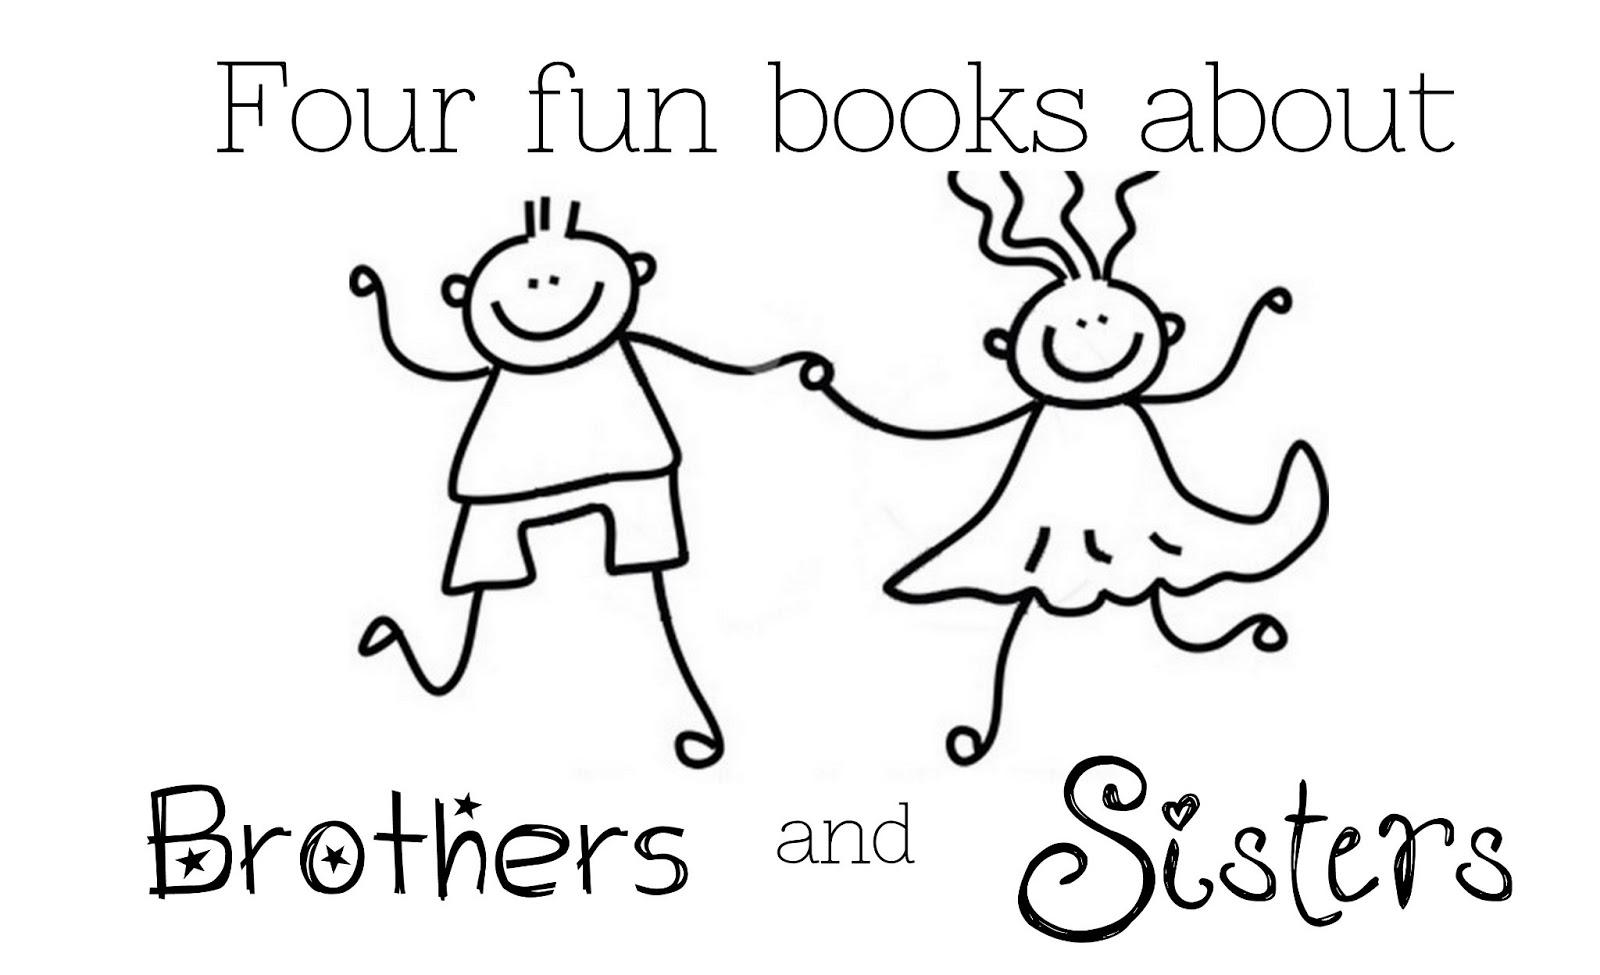 Serving Pink Lemonade Book Reviews Big Sisters Little Brothers